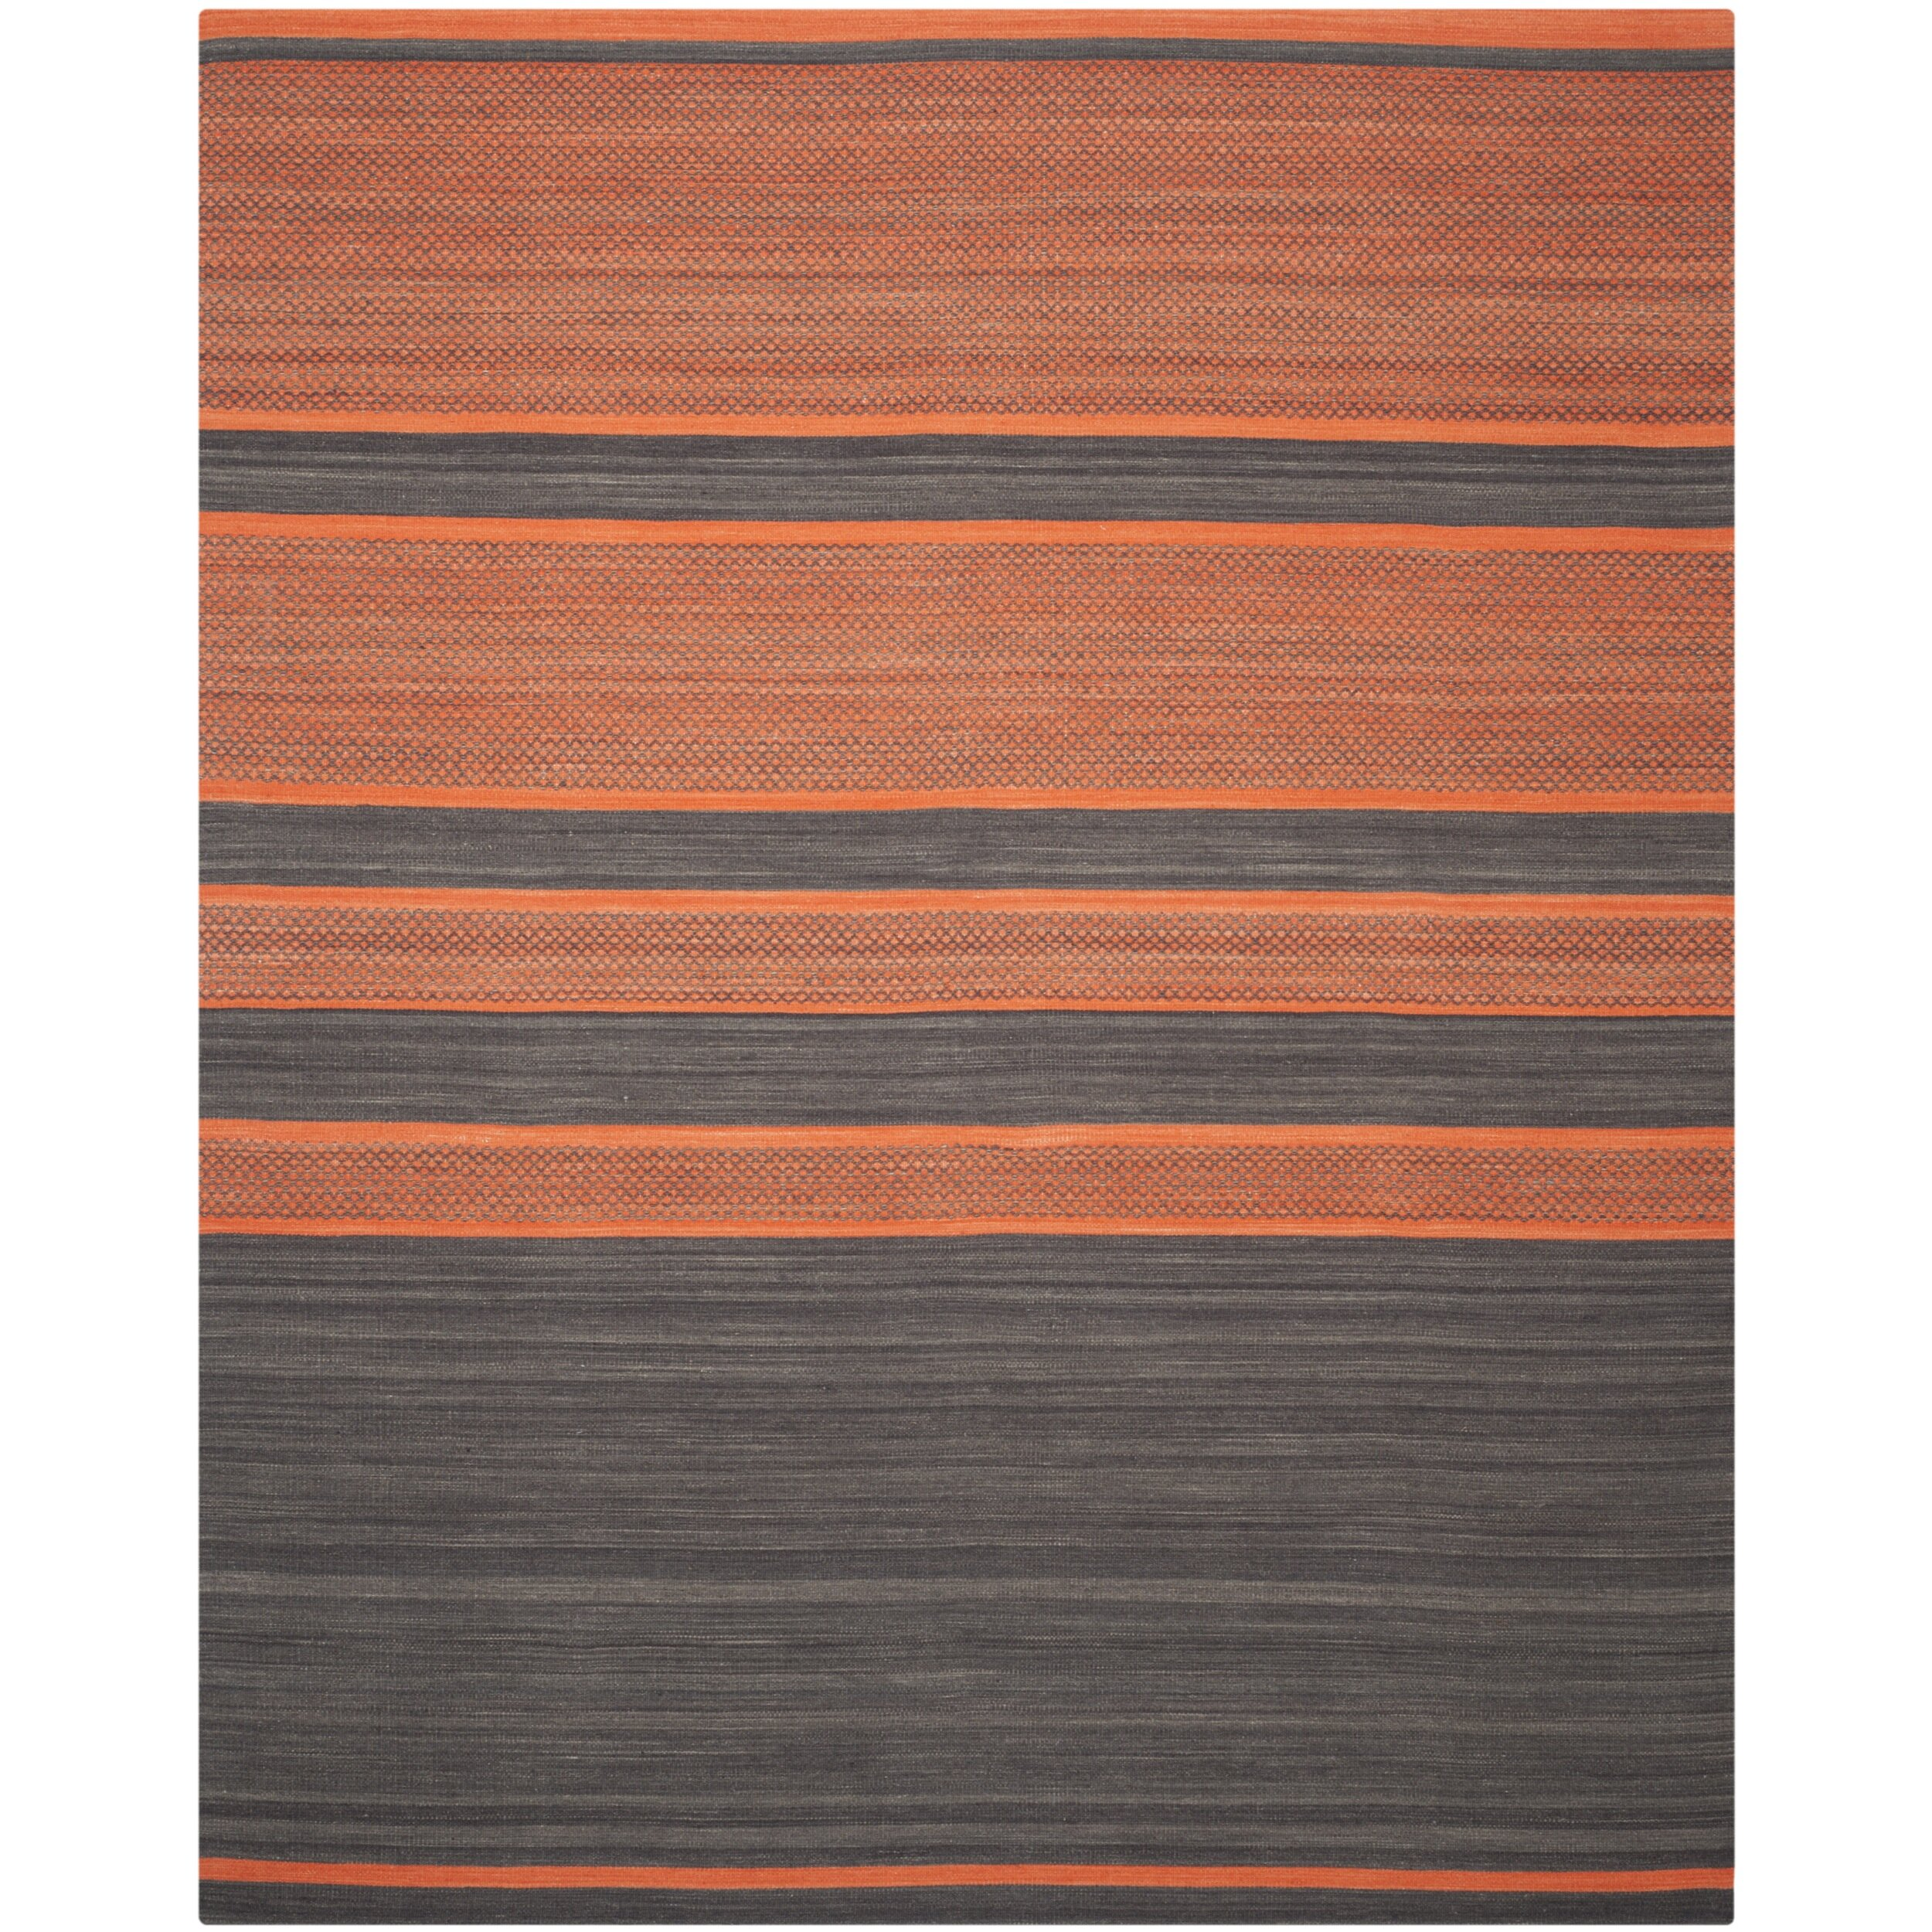 Safavieh Kilim Hand Woven Cotton Grey Orange Area Rug